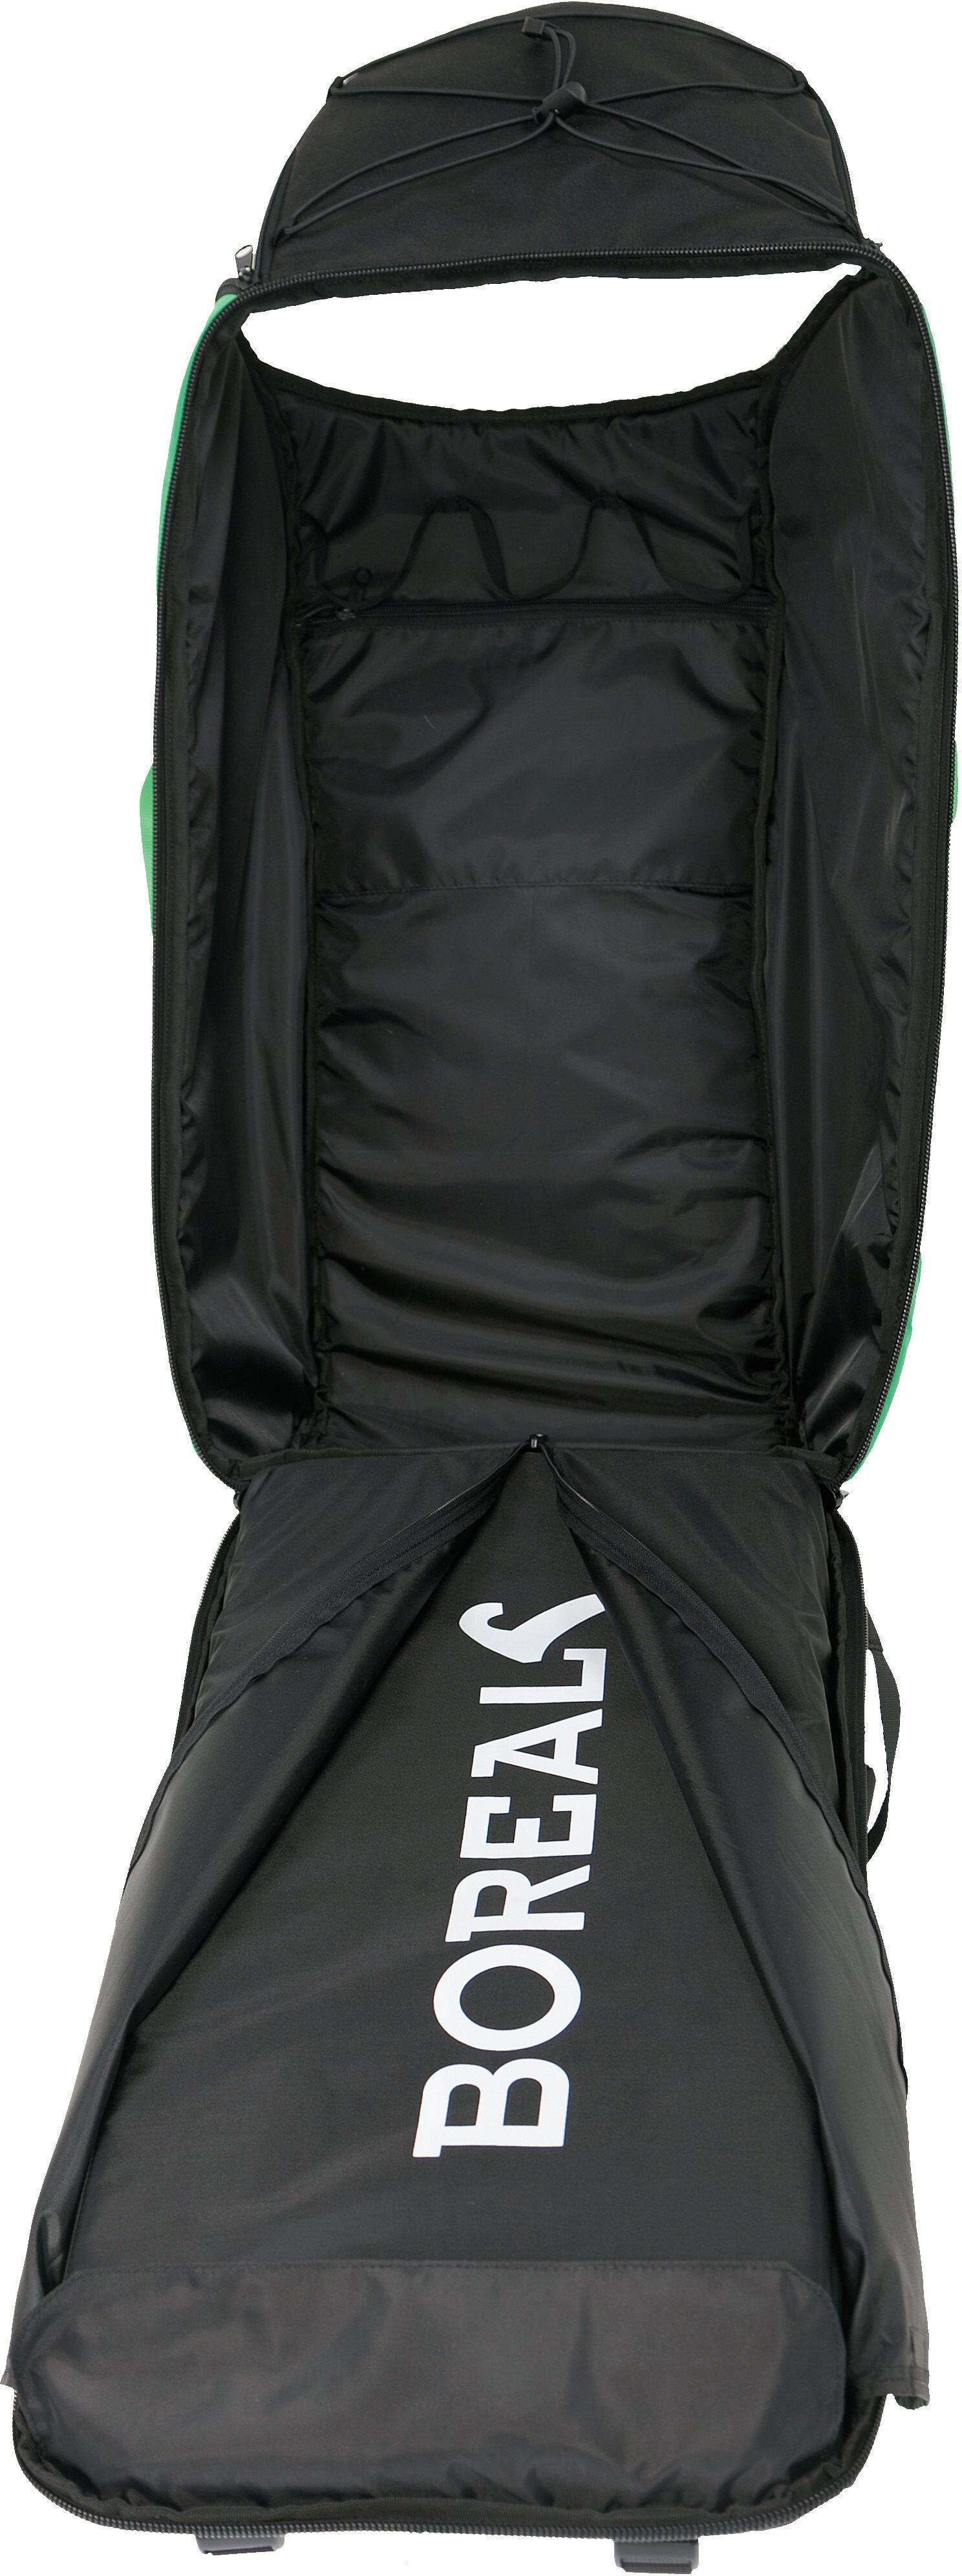 d1d41ae82a848 Boreal Rambla 50 Backpack green/black at Addnature.co.uk